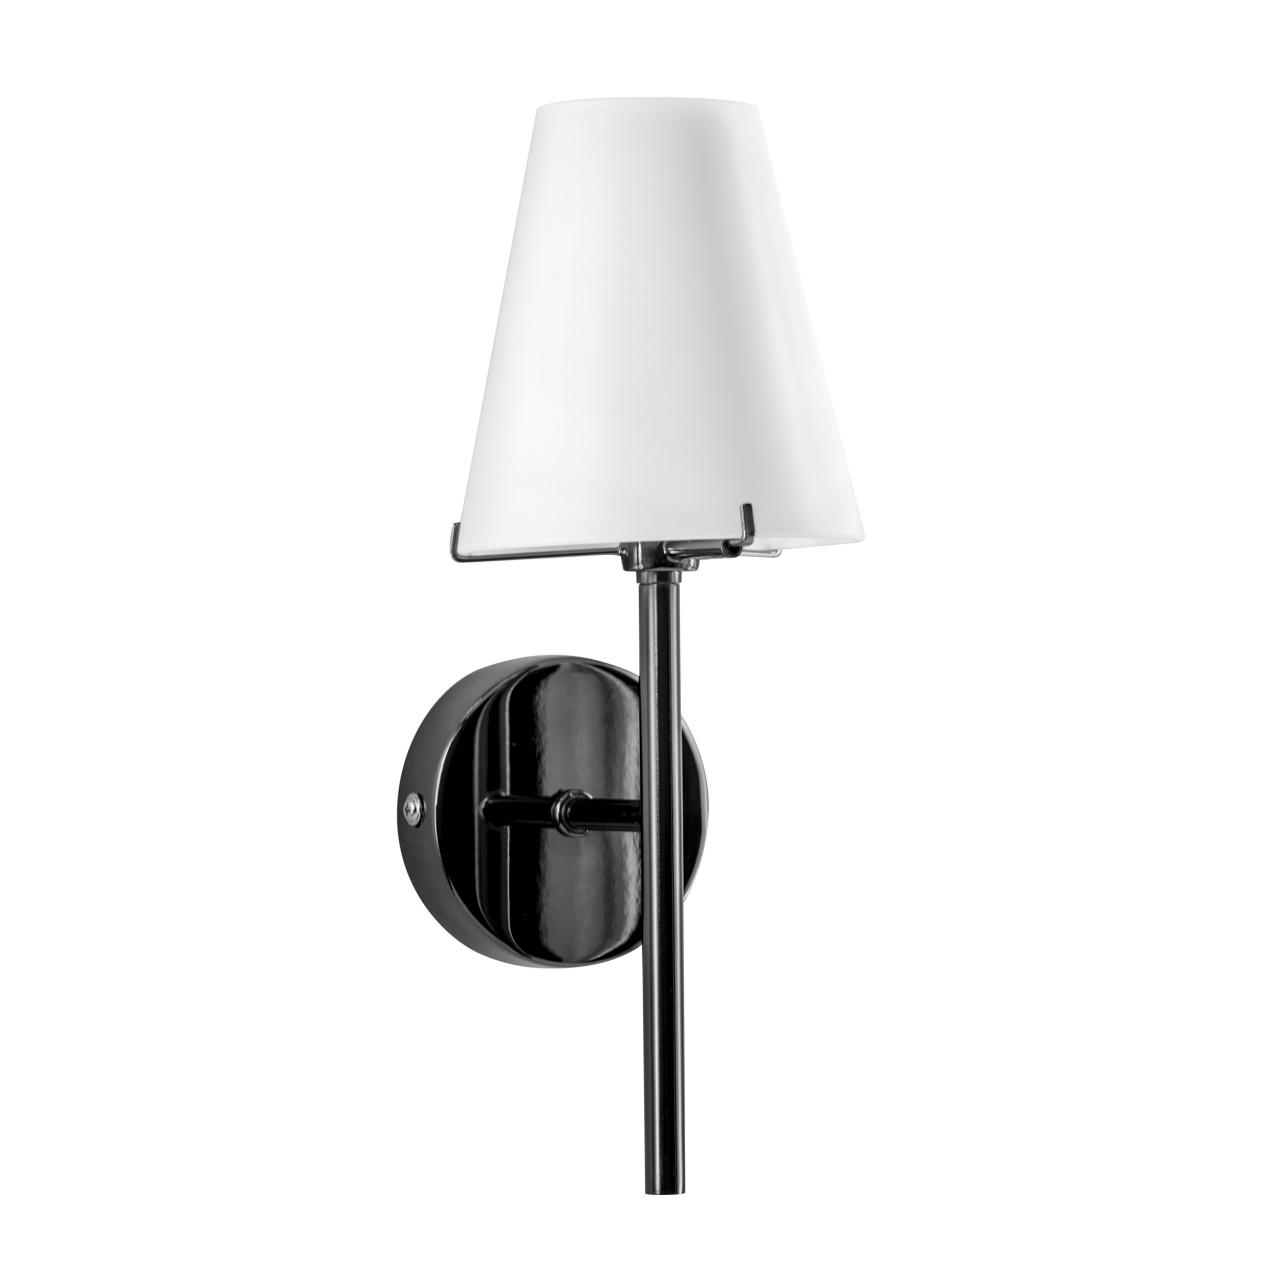 Бра Diafano 1х40W G9 черный хром / белый Lightstar 758617